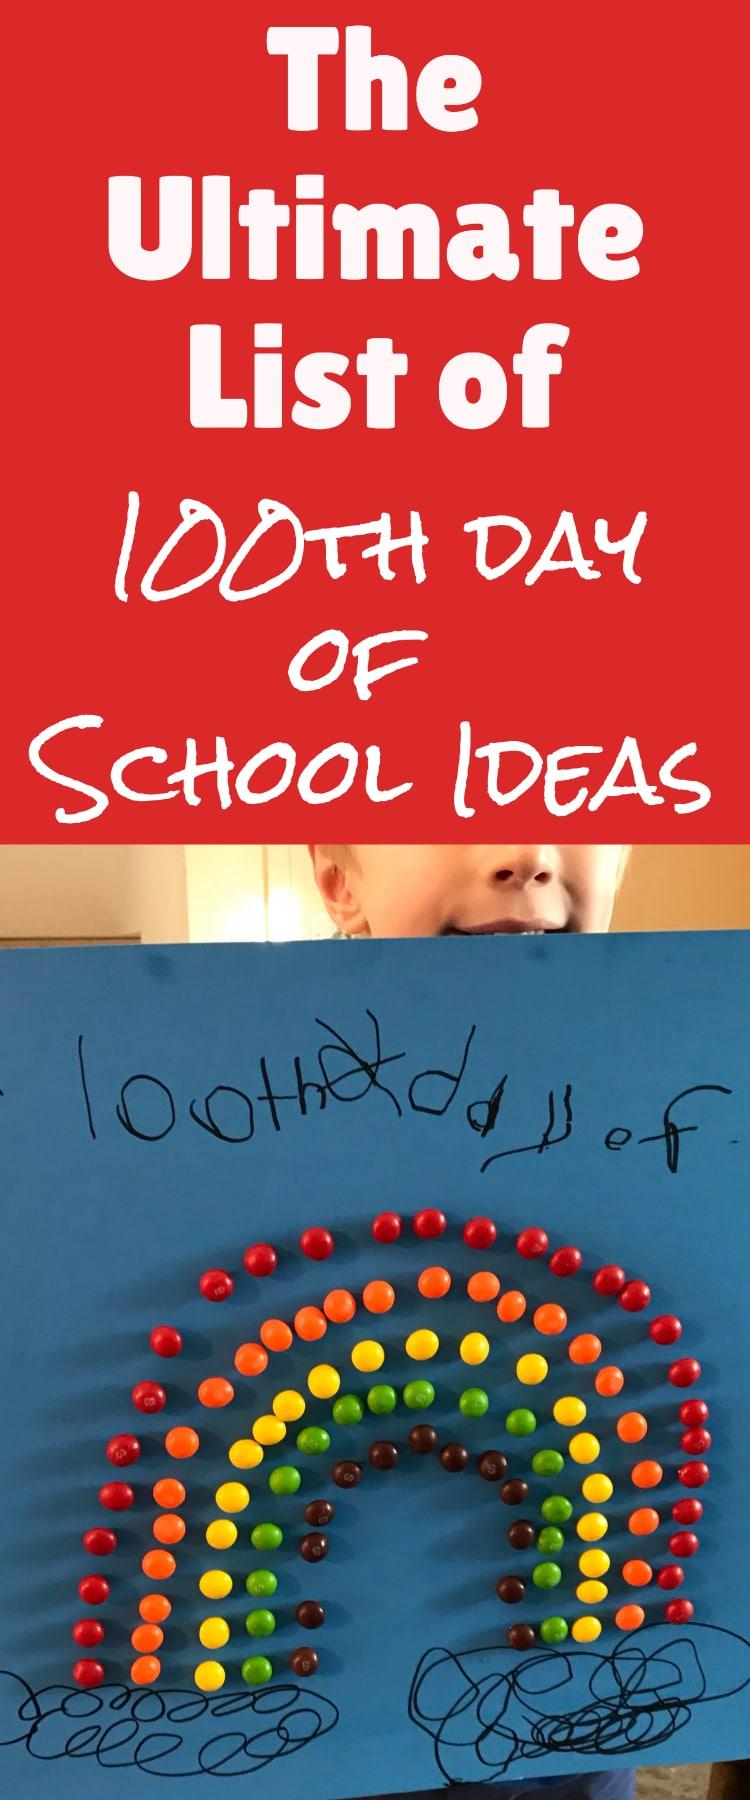 100 days of school / 100th day of school / 100th day of school ideas / kindergarten / kindergarten ideas / elementary school / class parent #100thdayofschool #100daysofschool #kindergarten